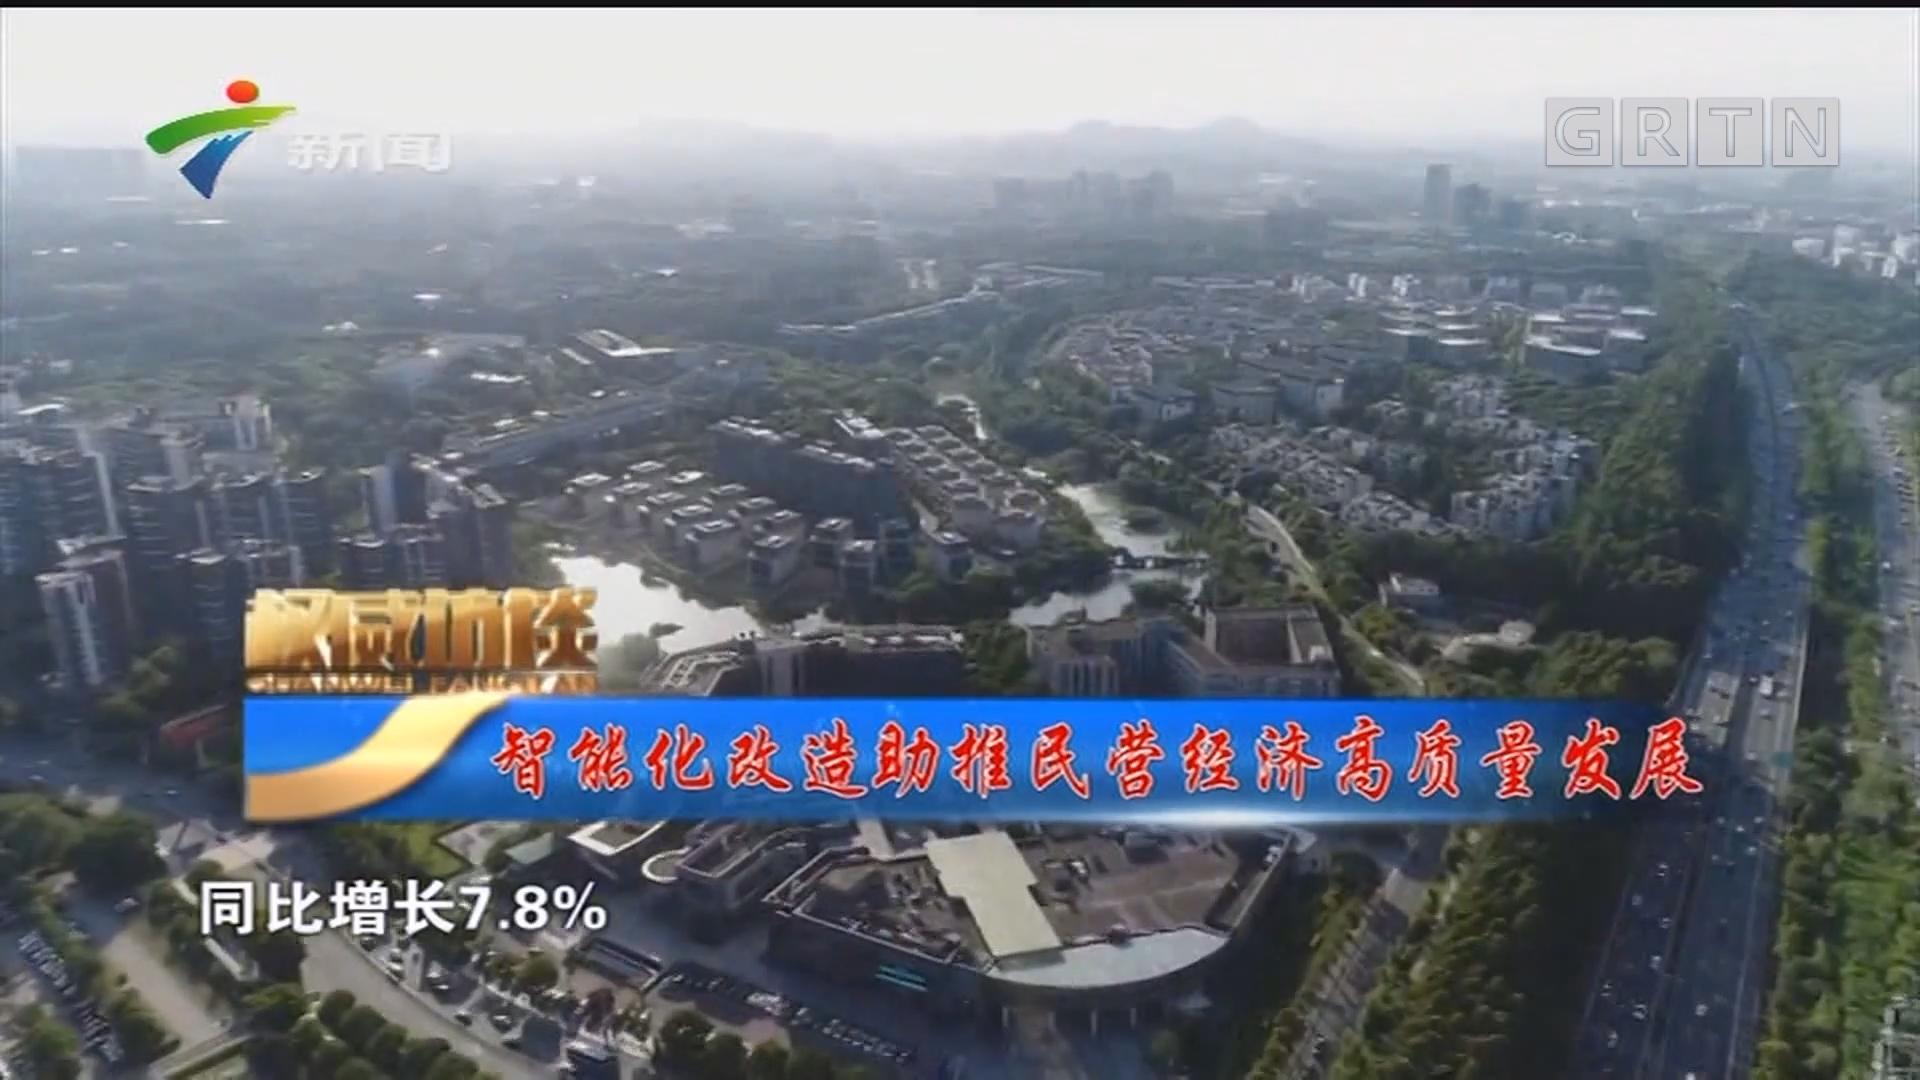 [HD][2019-06-29]权威访谈:智能化改造助推民营经济高质量发展